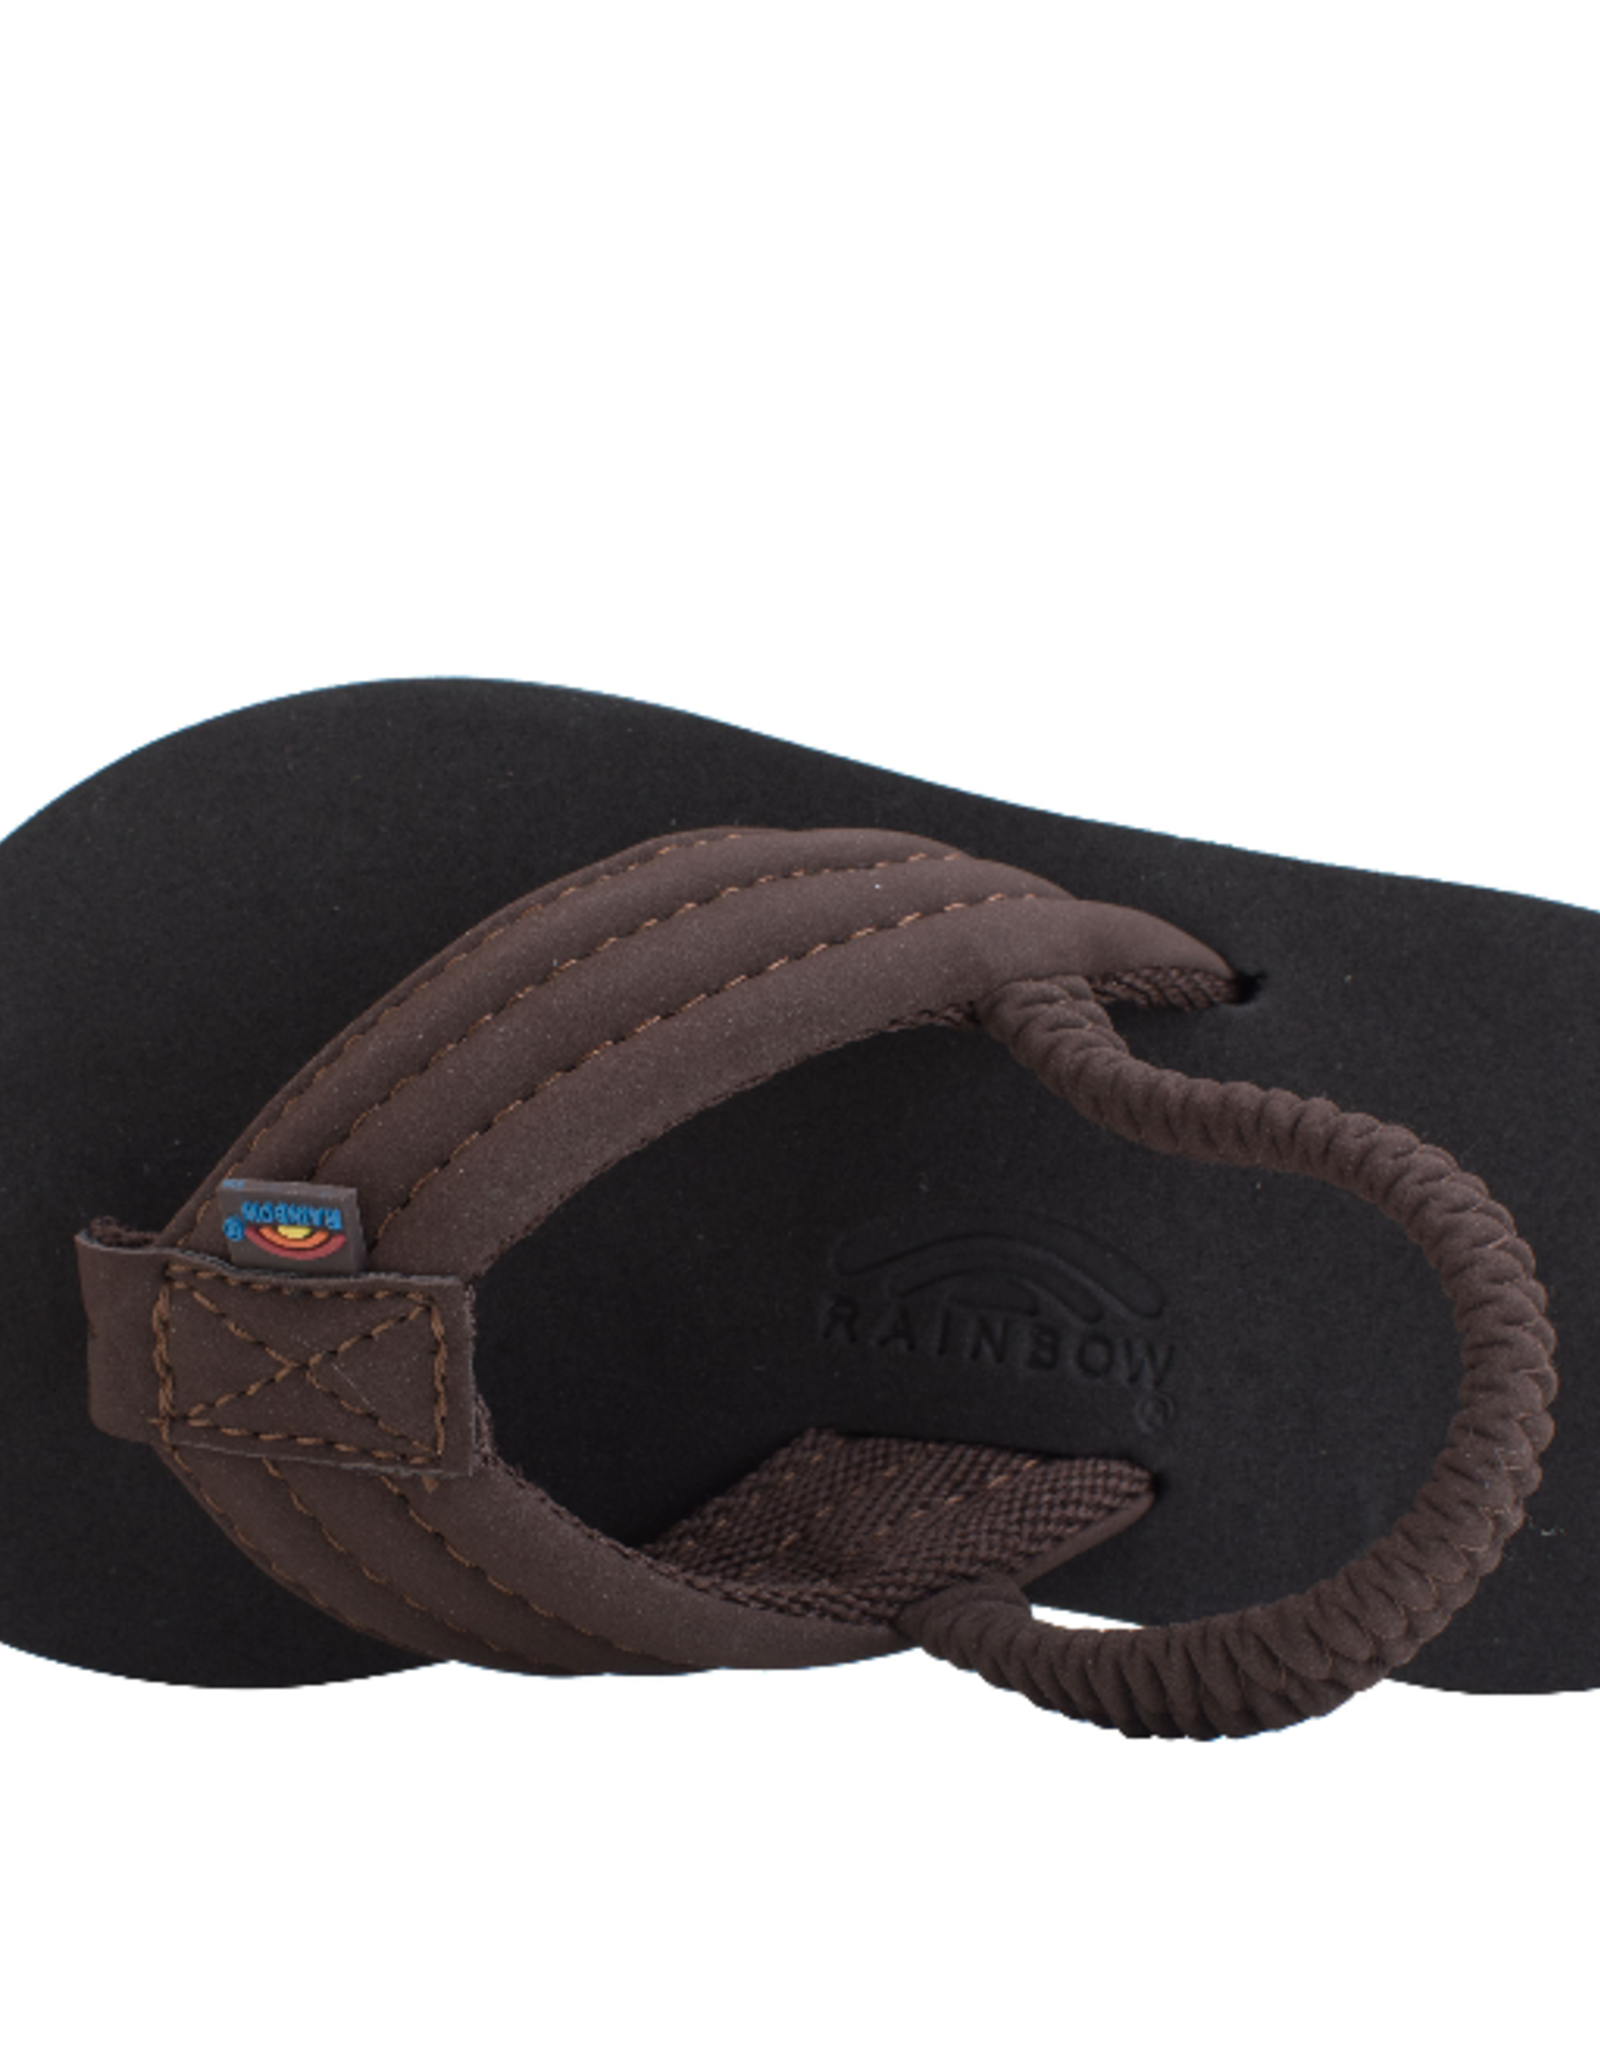 Rainbow Sandals Grombows Brown Black BRBK